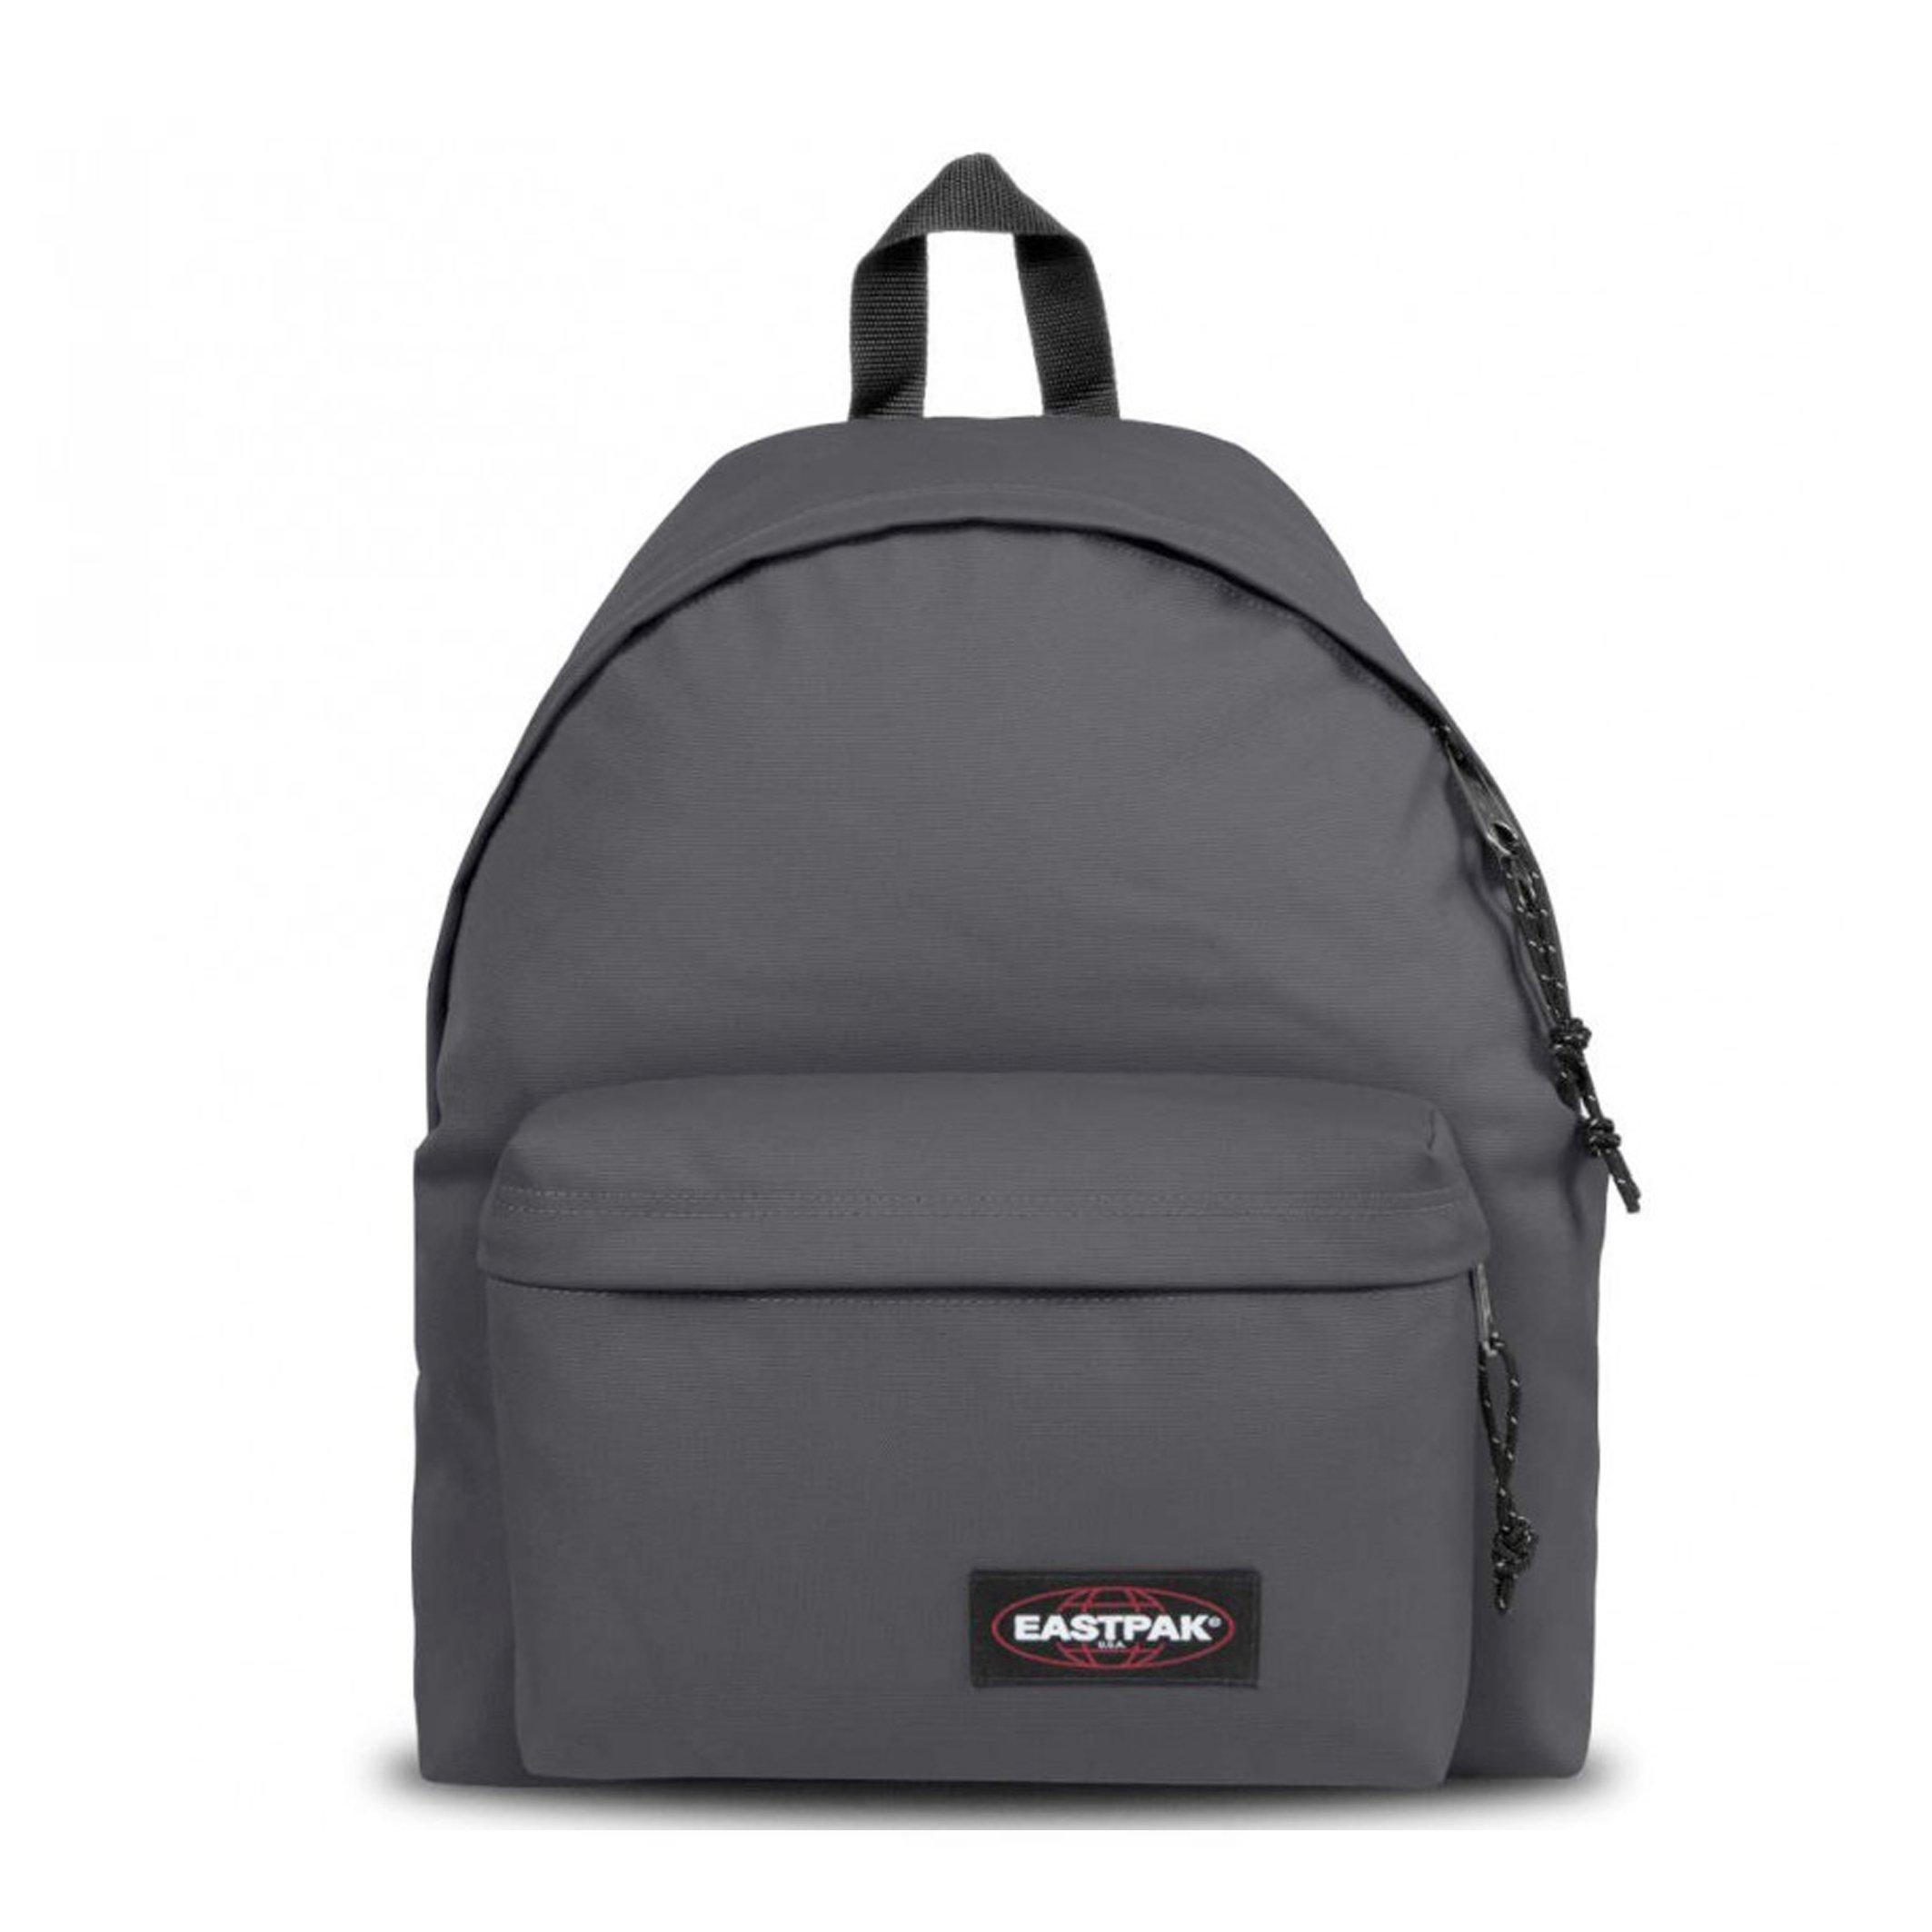 Eastpak Unisex Backpack Various Colours EK000620_008 - grey NOSIZE